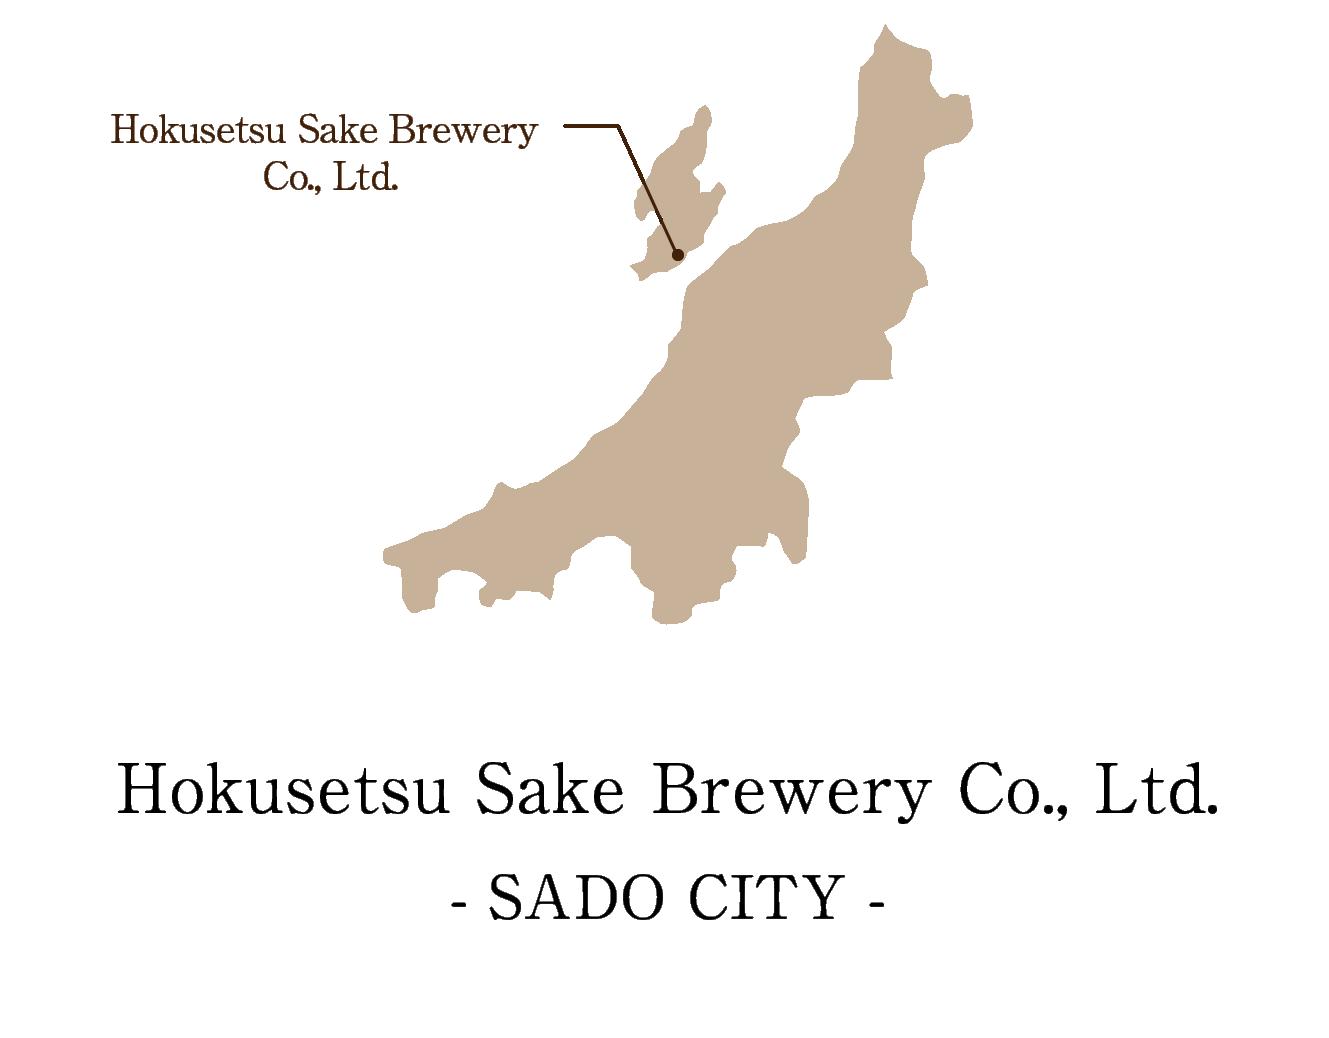 Hokusetsu Shuzo Co., Ltd. SADO CITY